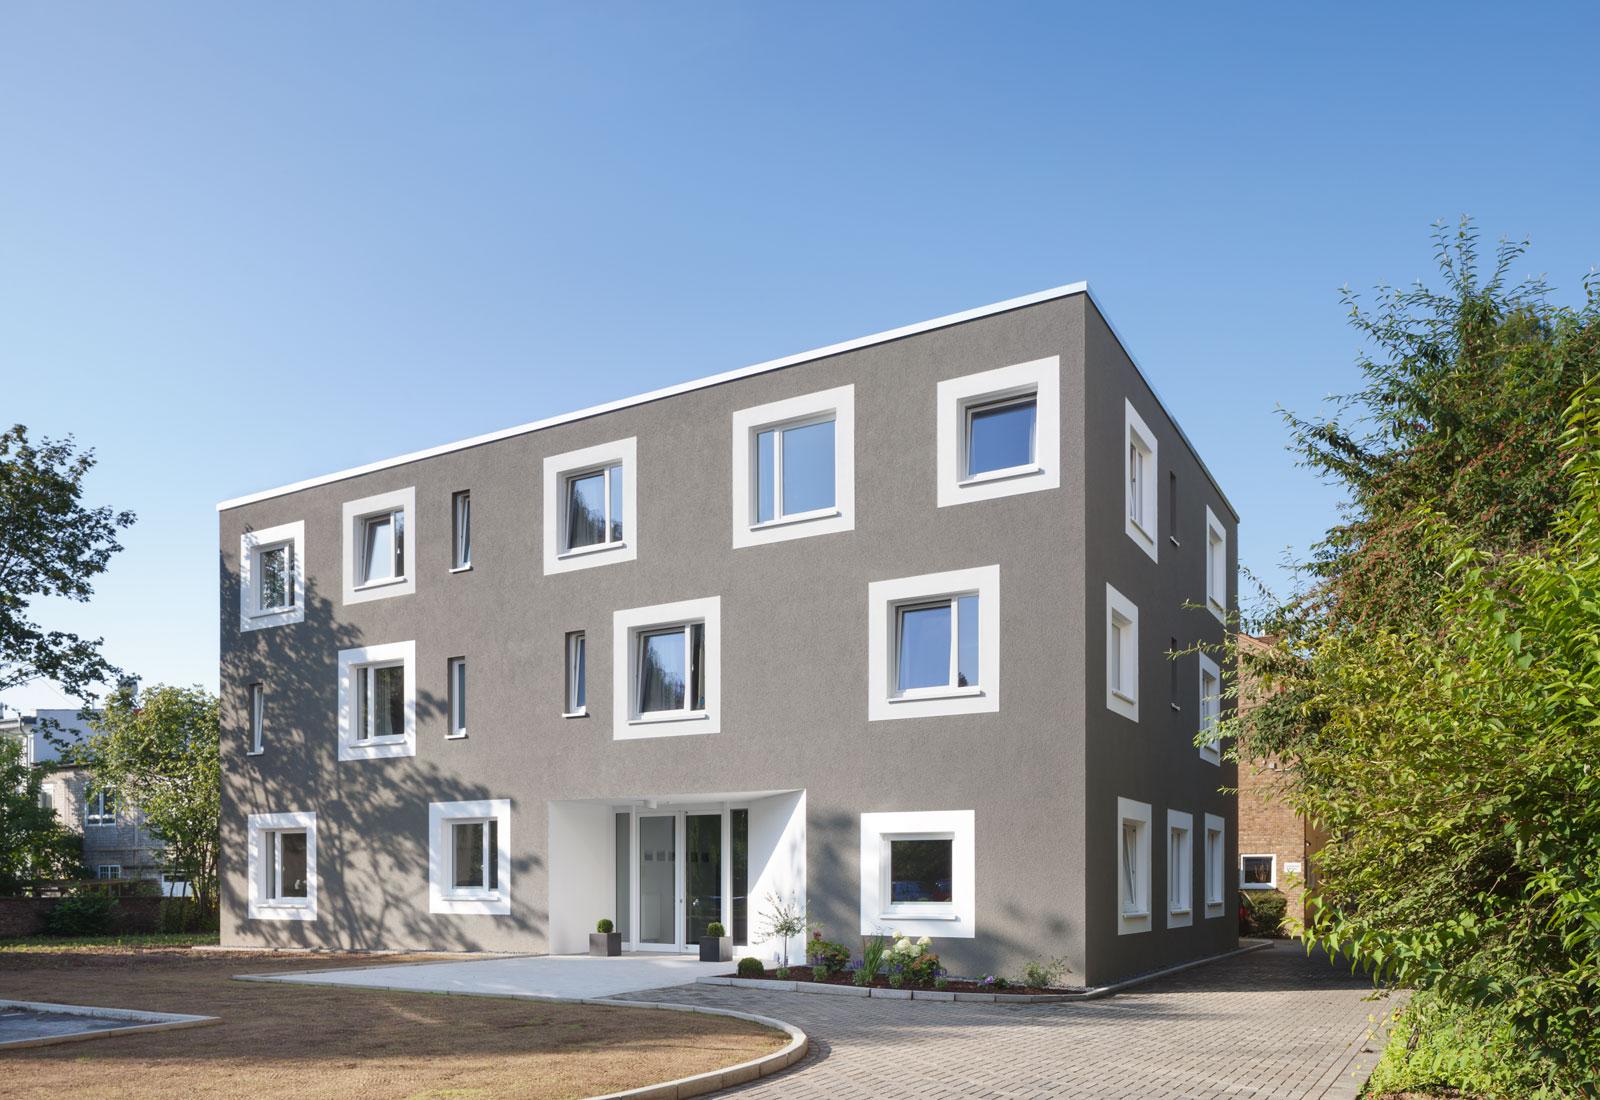 Neubau Jugendwohnheim Abbruch, Jugendwohnheim, Koenigs Rütter Architket